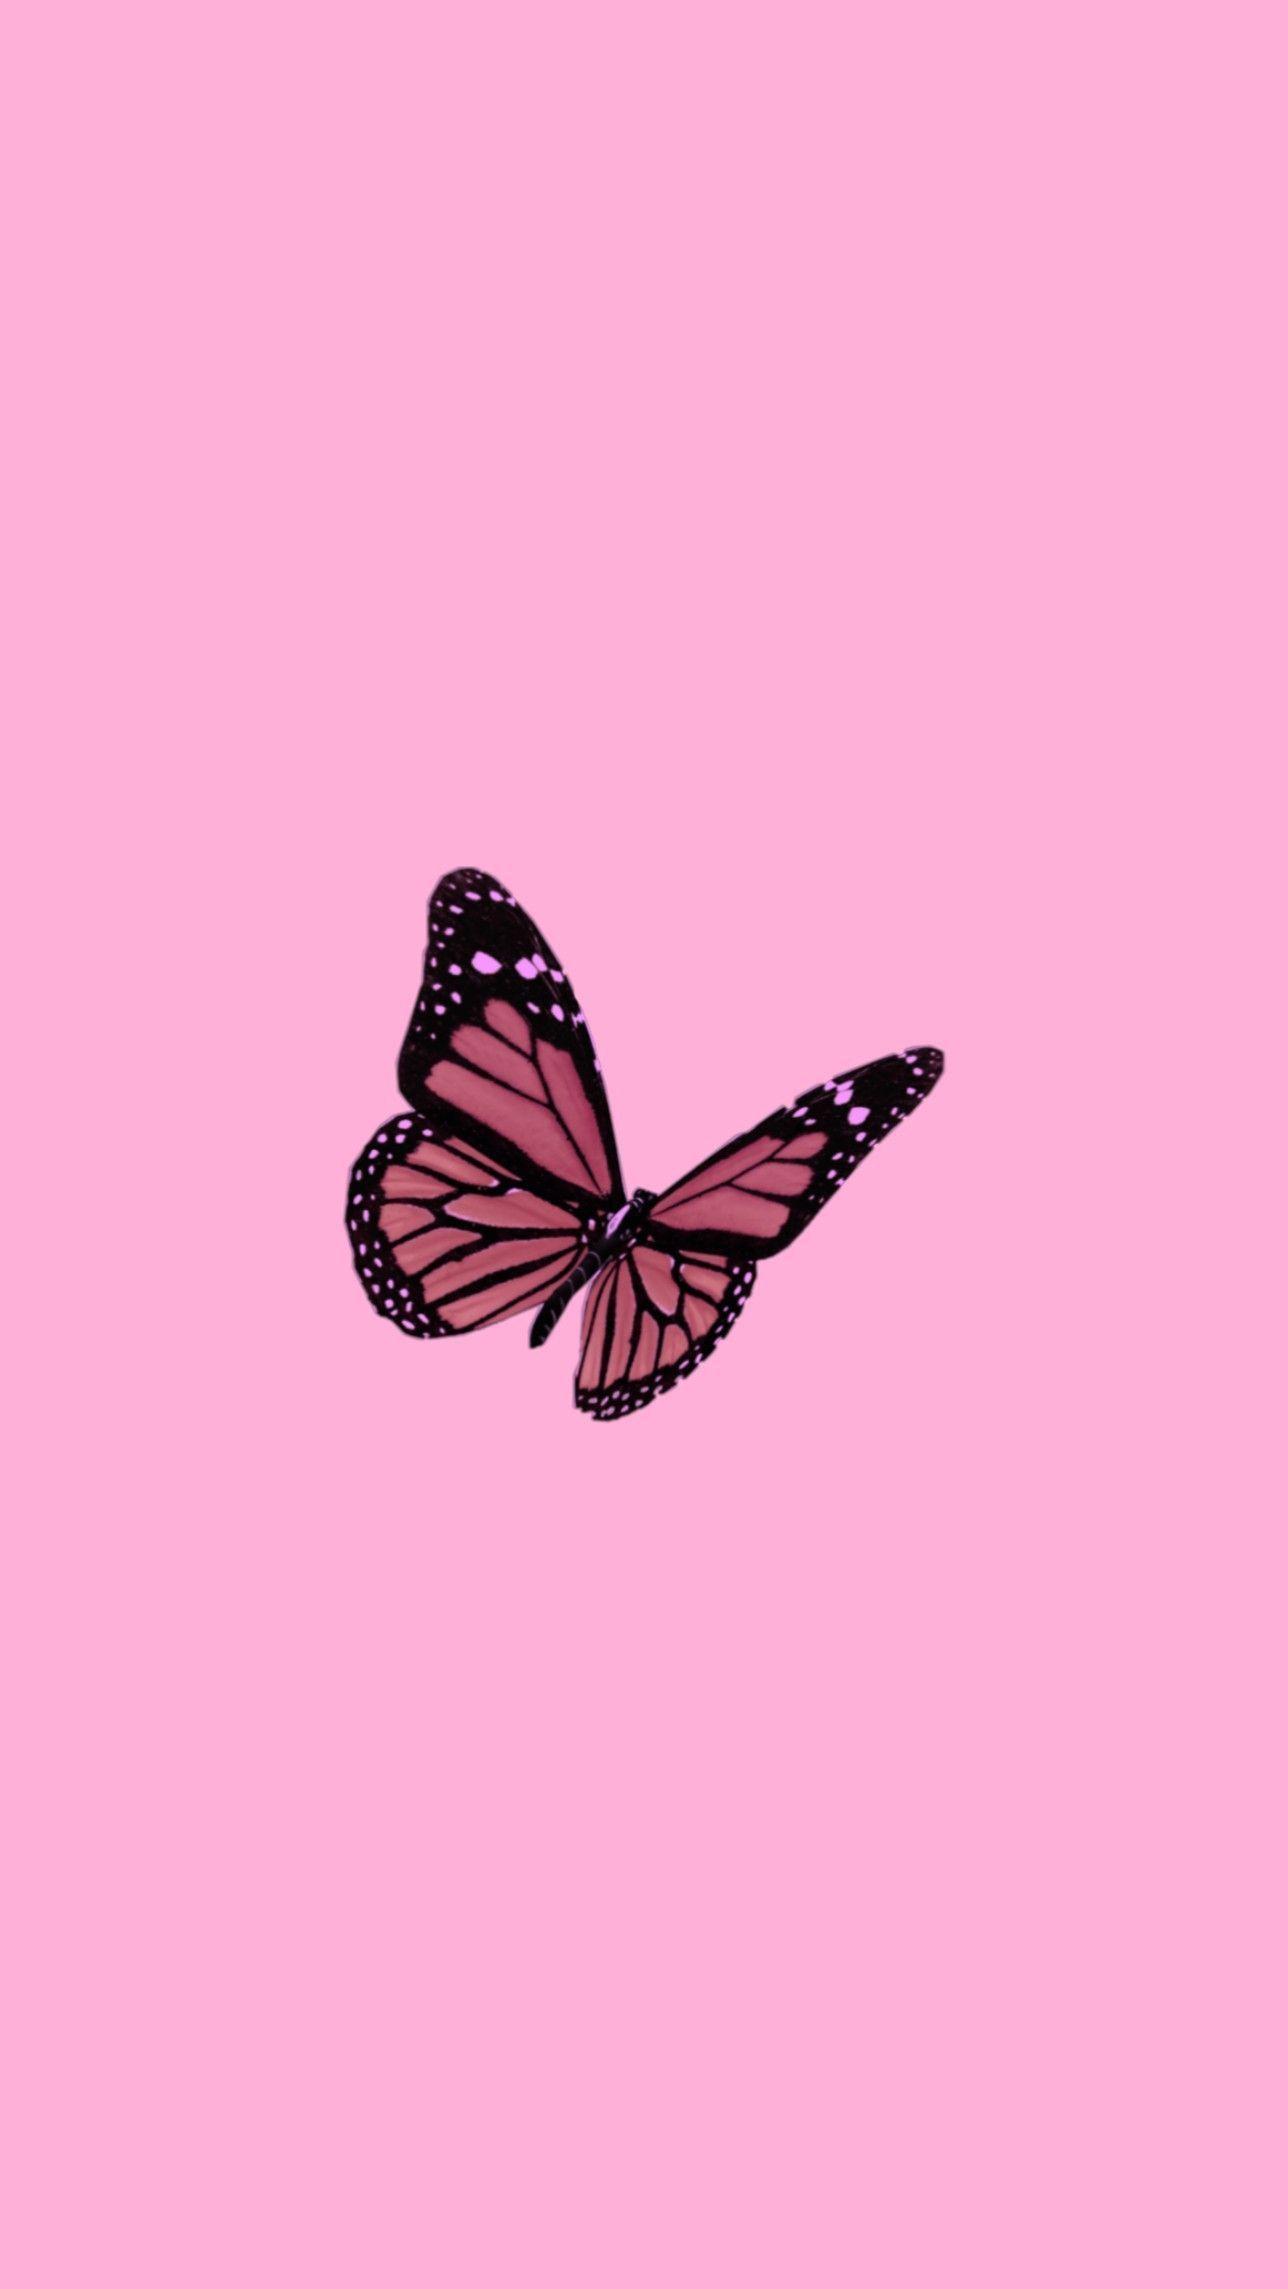 Butterfly wallpaper #lockscreenwallpaper